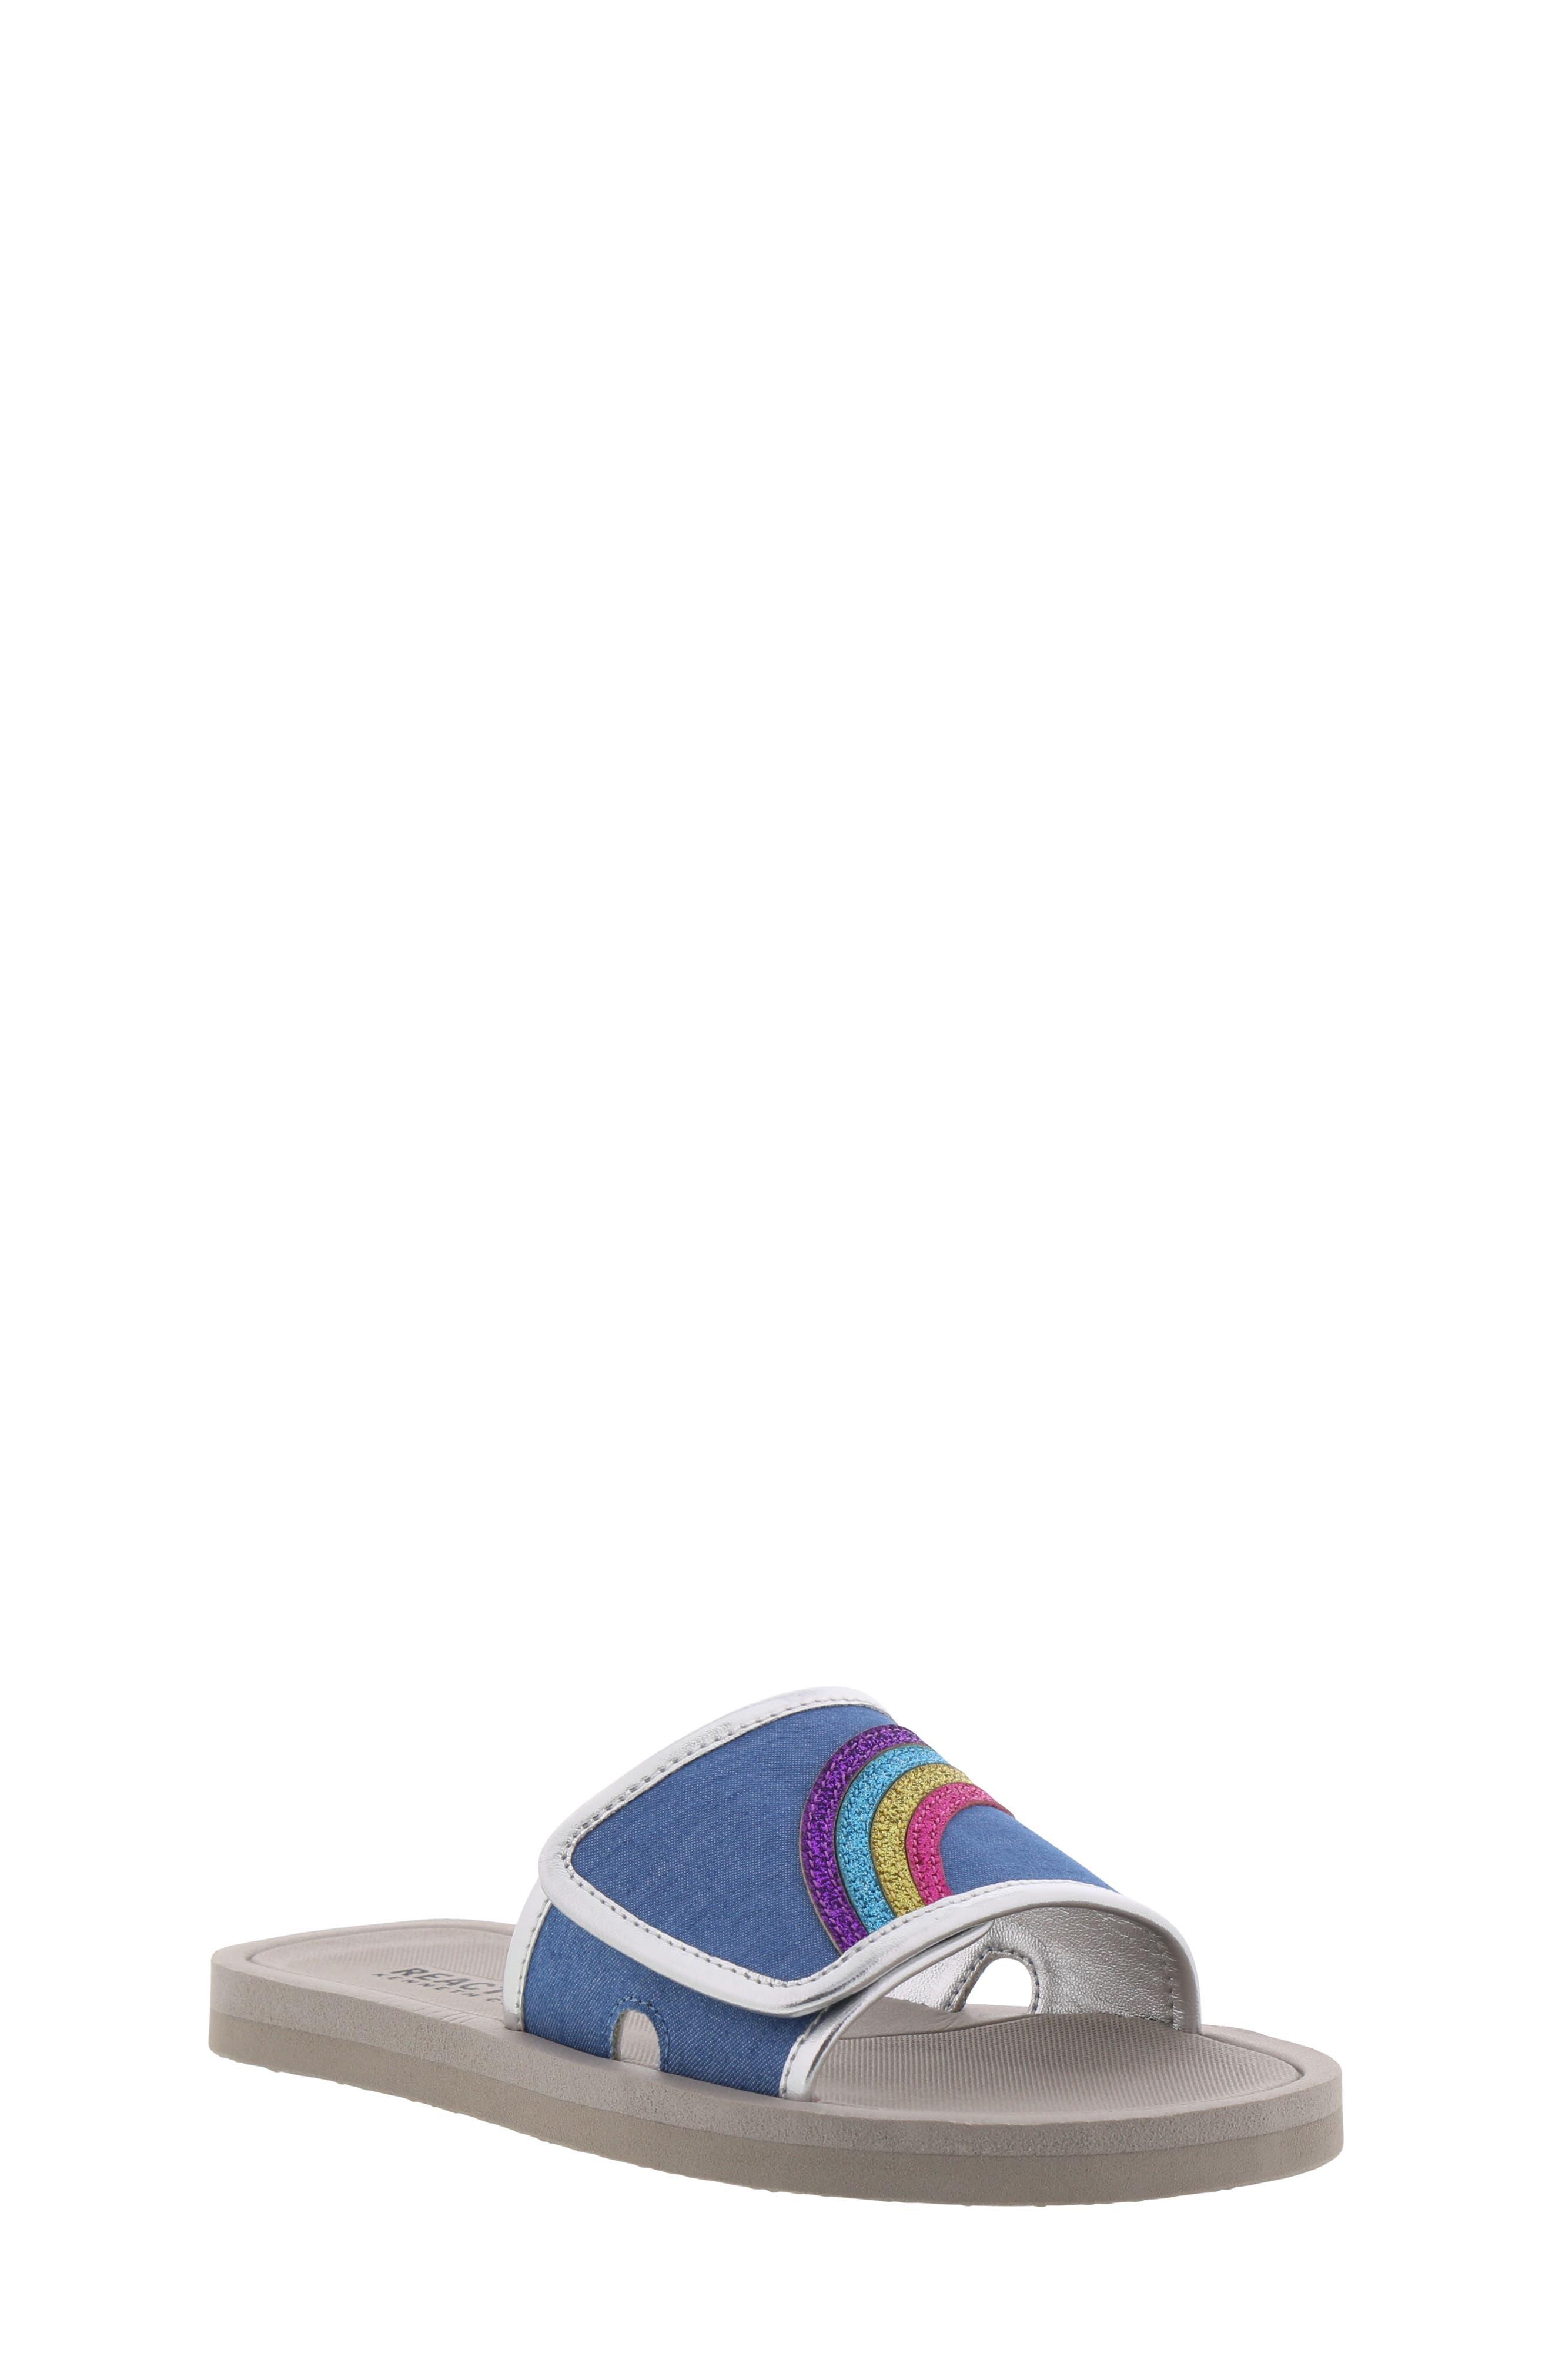 REACTION KENNETH COLE Elise Karla Rainbow Slide Sandal, Main, color, DENIM